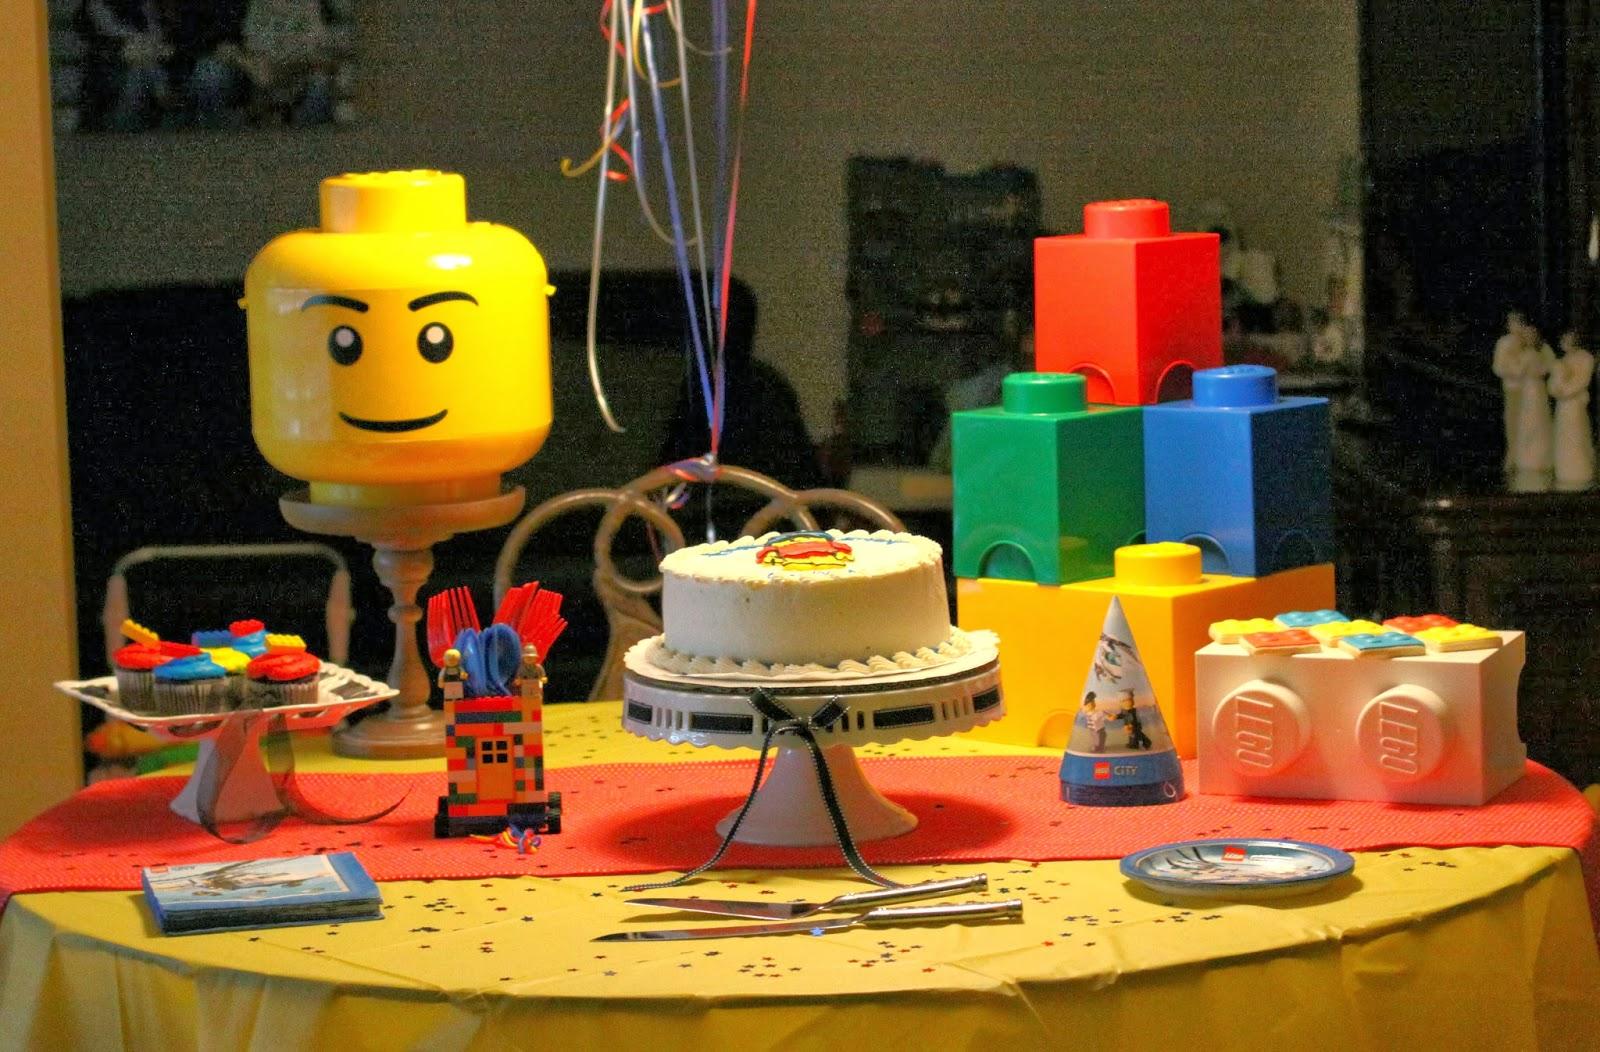 Life As A Frazier Gavins Lego Birthday Party